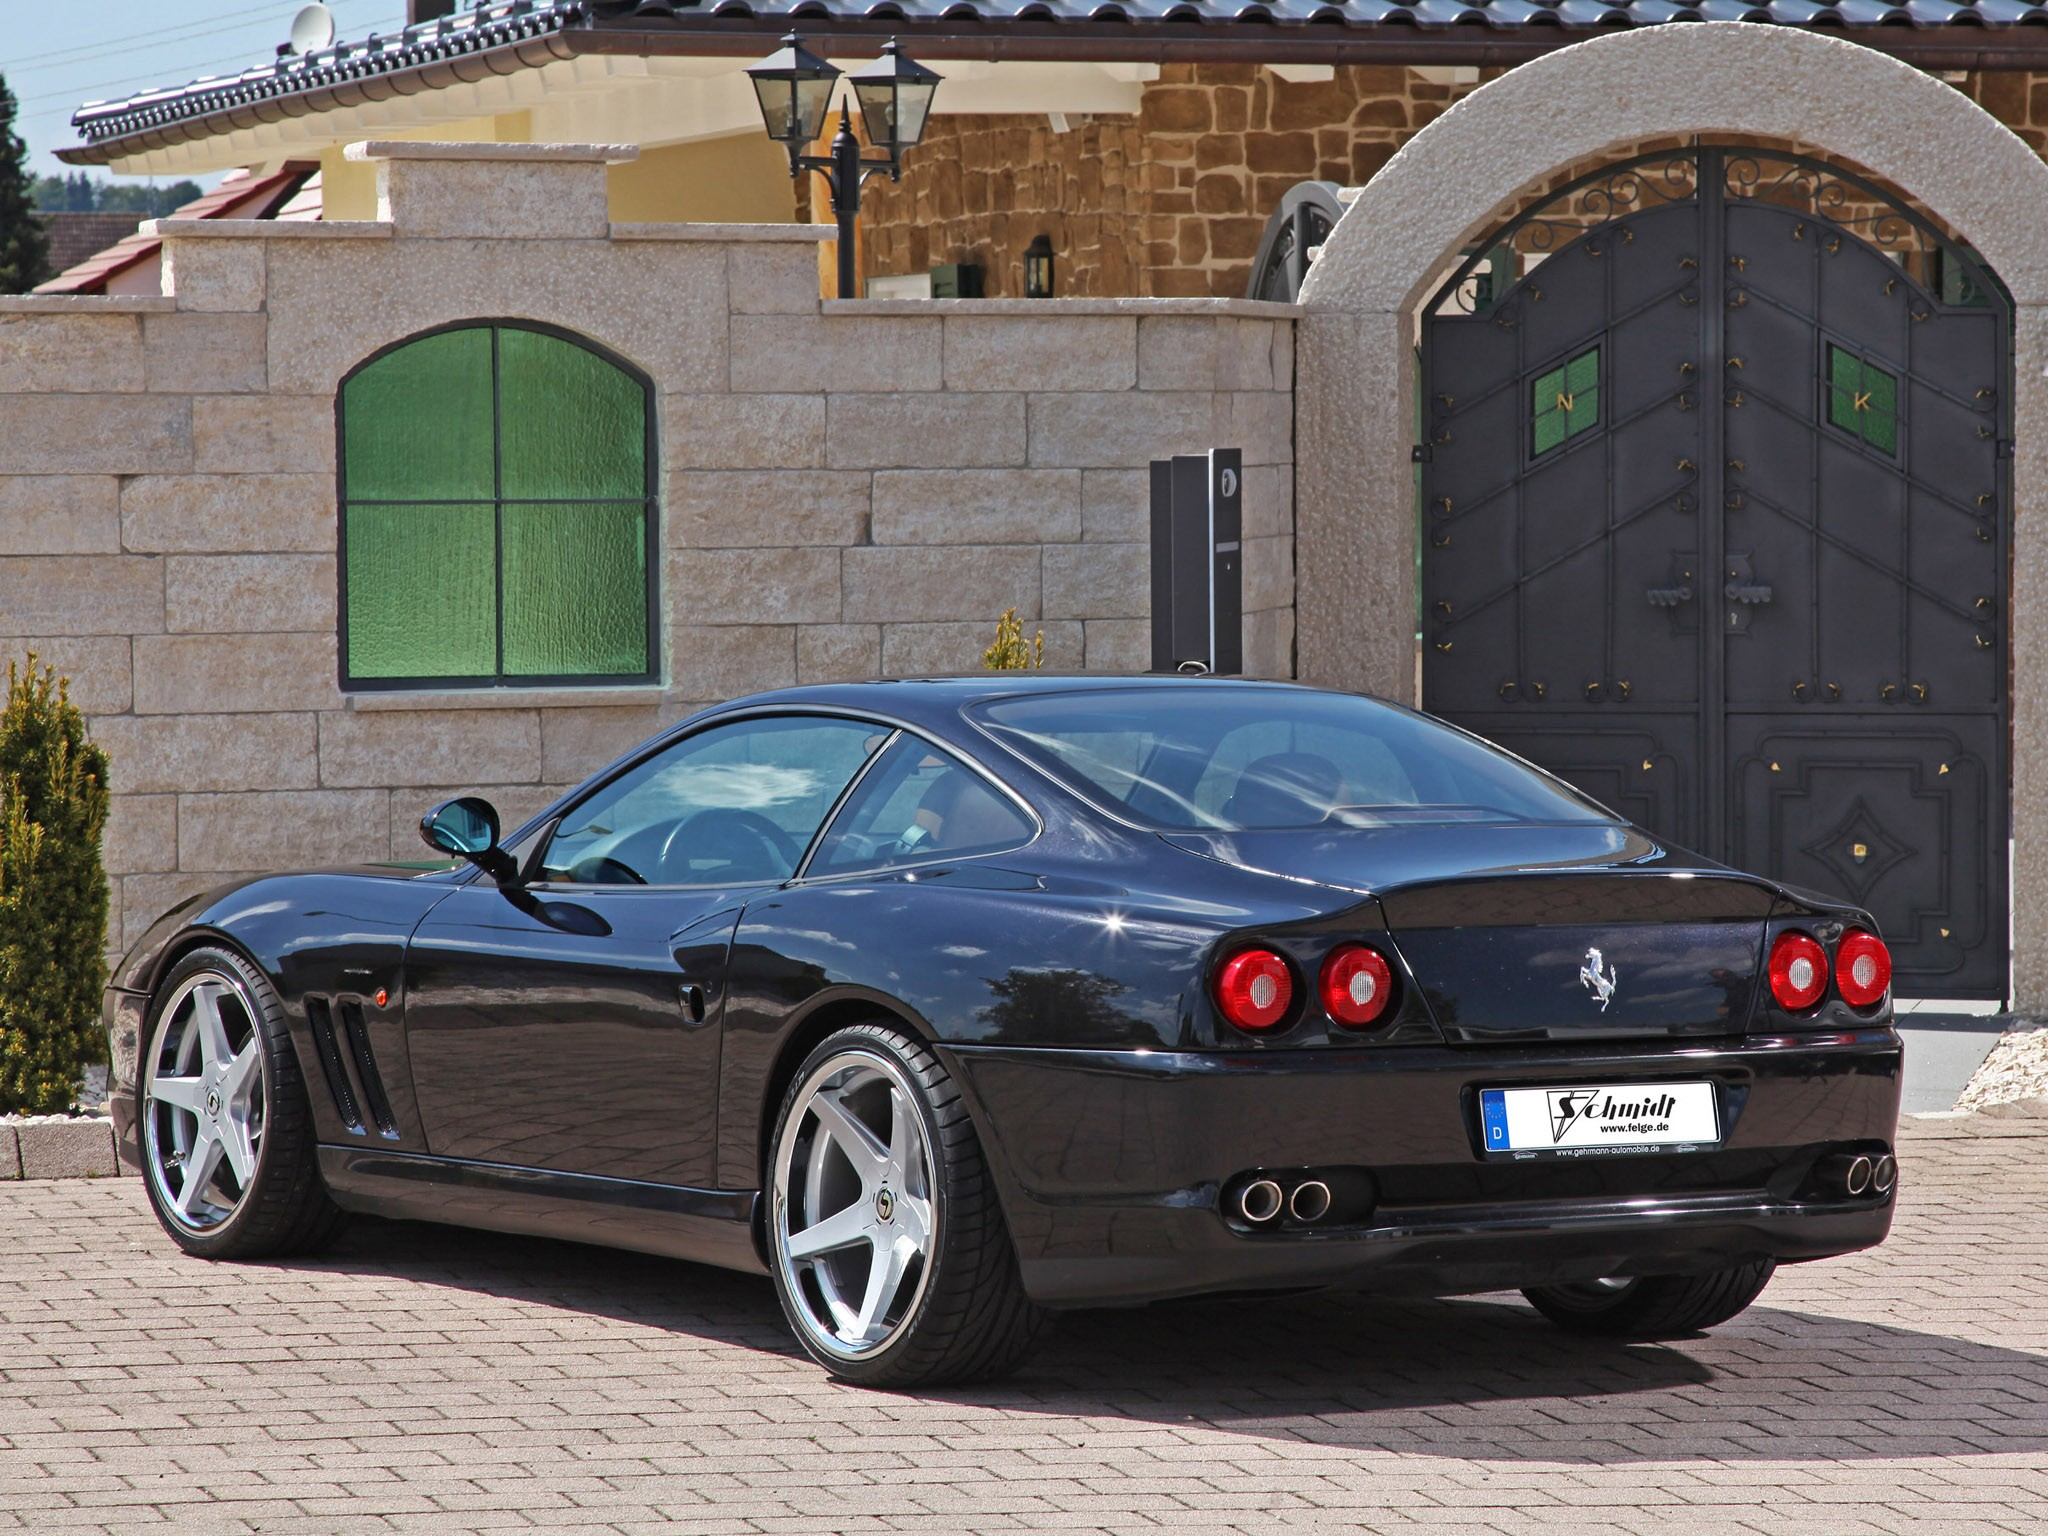 Ferrari 575M (2002) - Schmidt Revolution